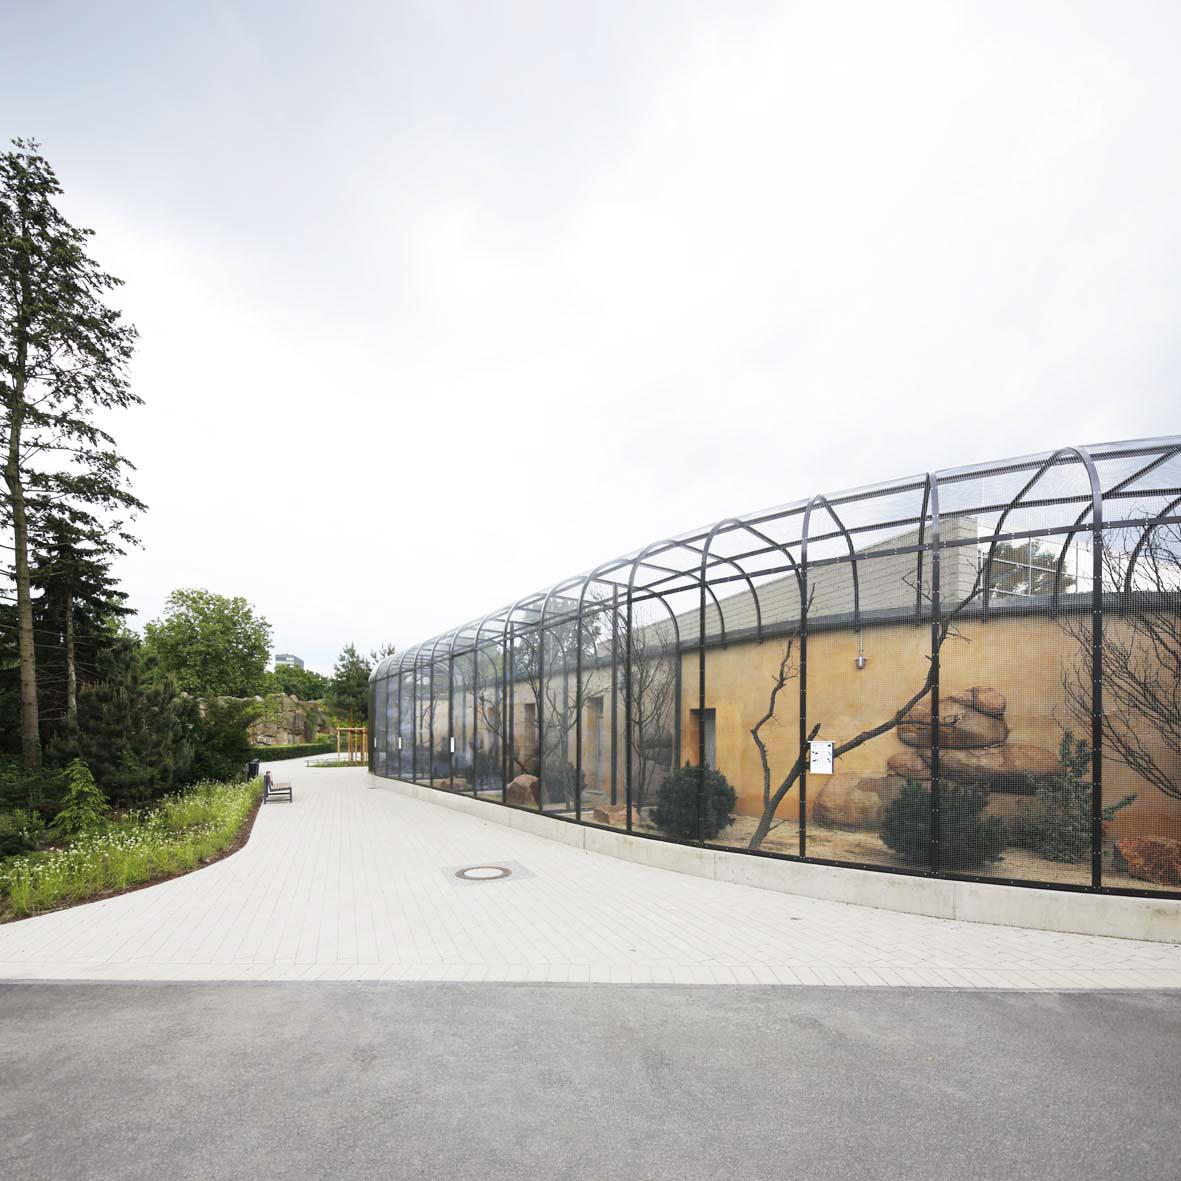 Loops entlang der Wege der Parklandschaft des Zoos